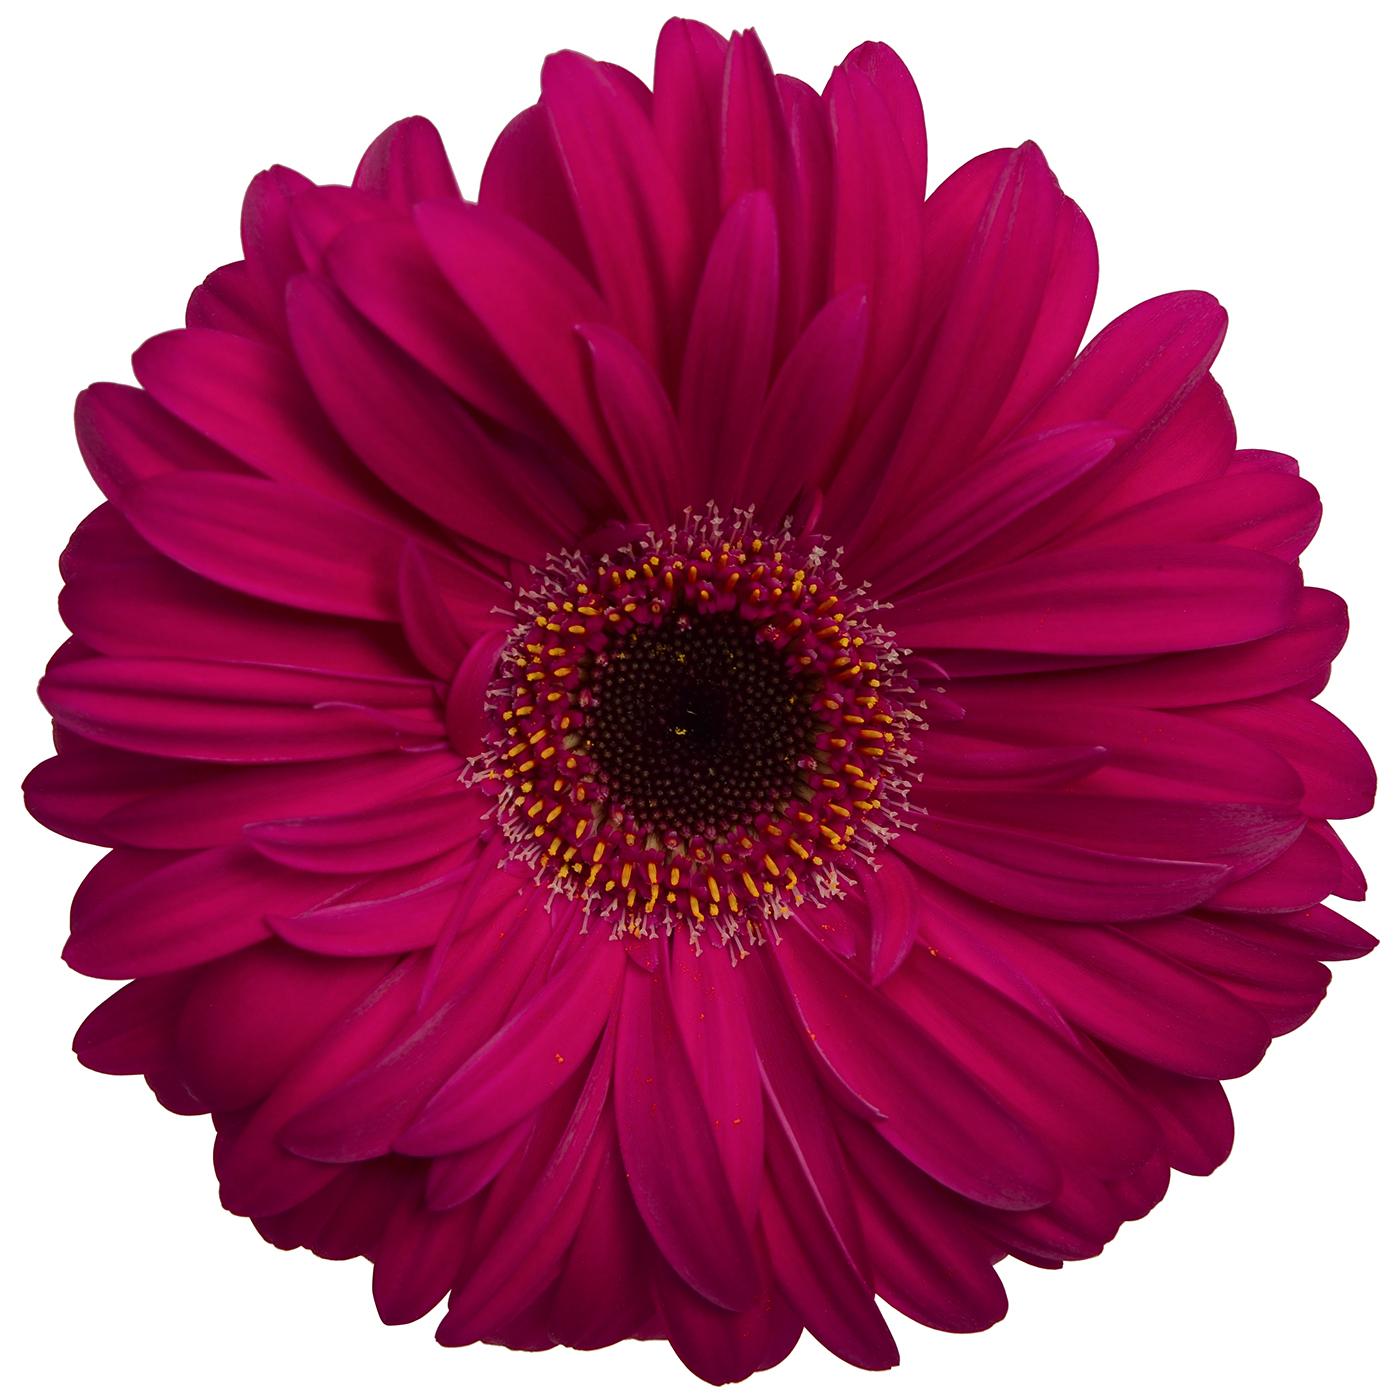 Gerbera Daisy Hot Pink Dark Center